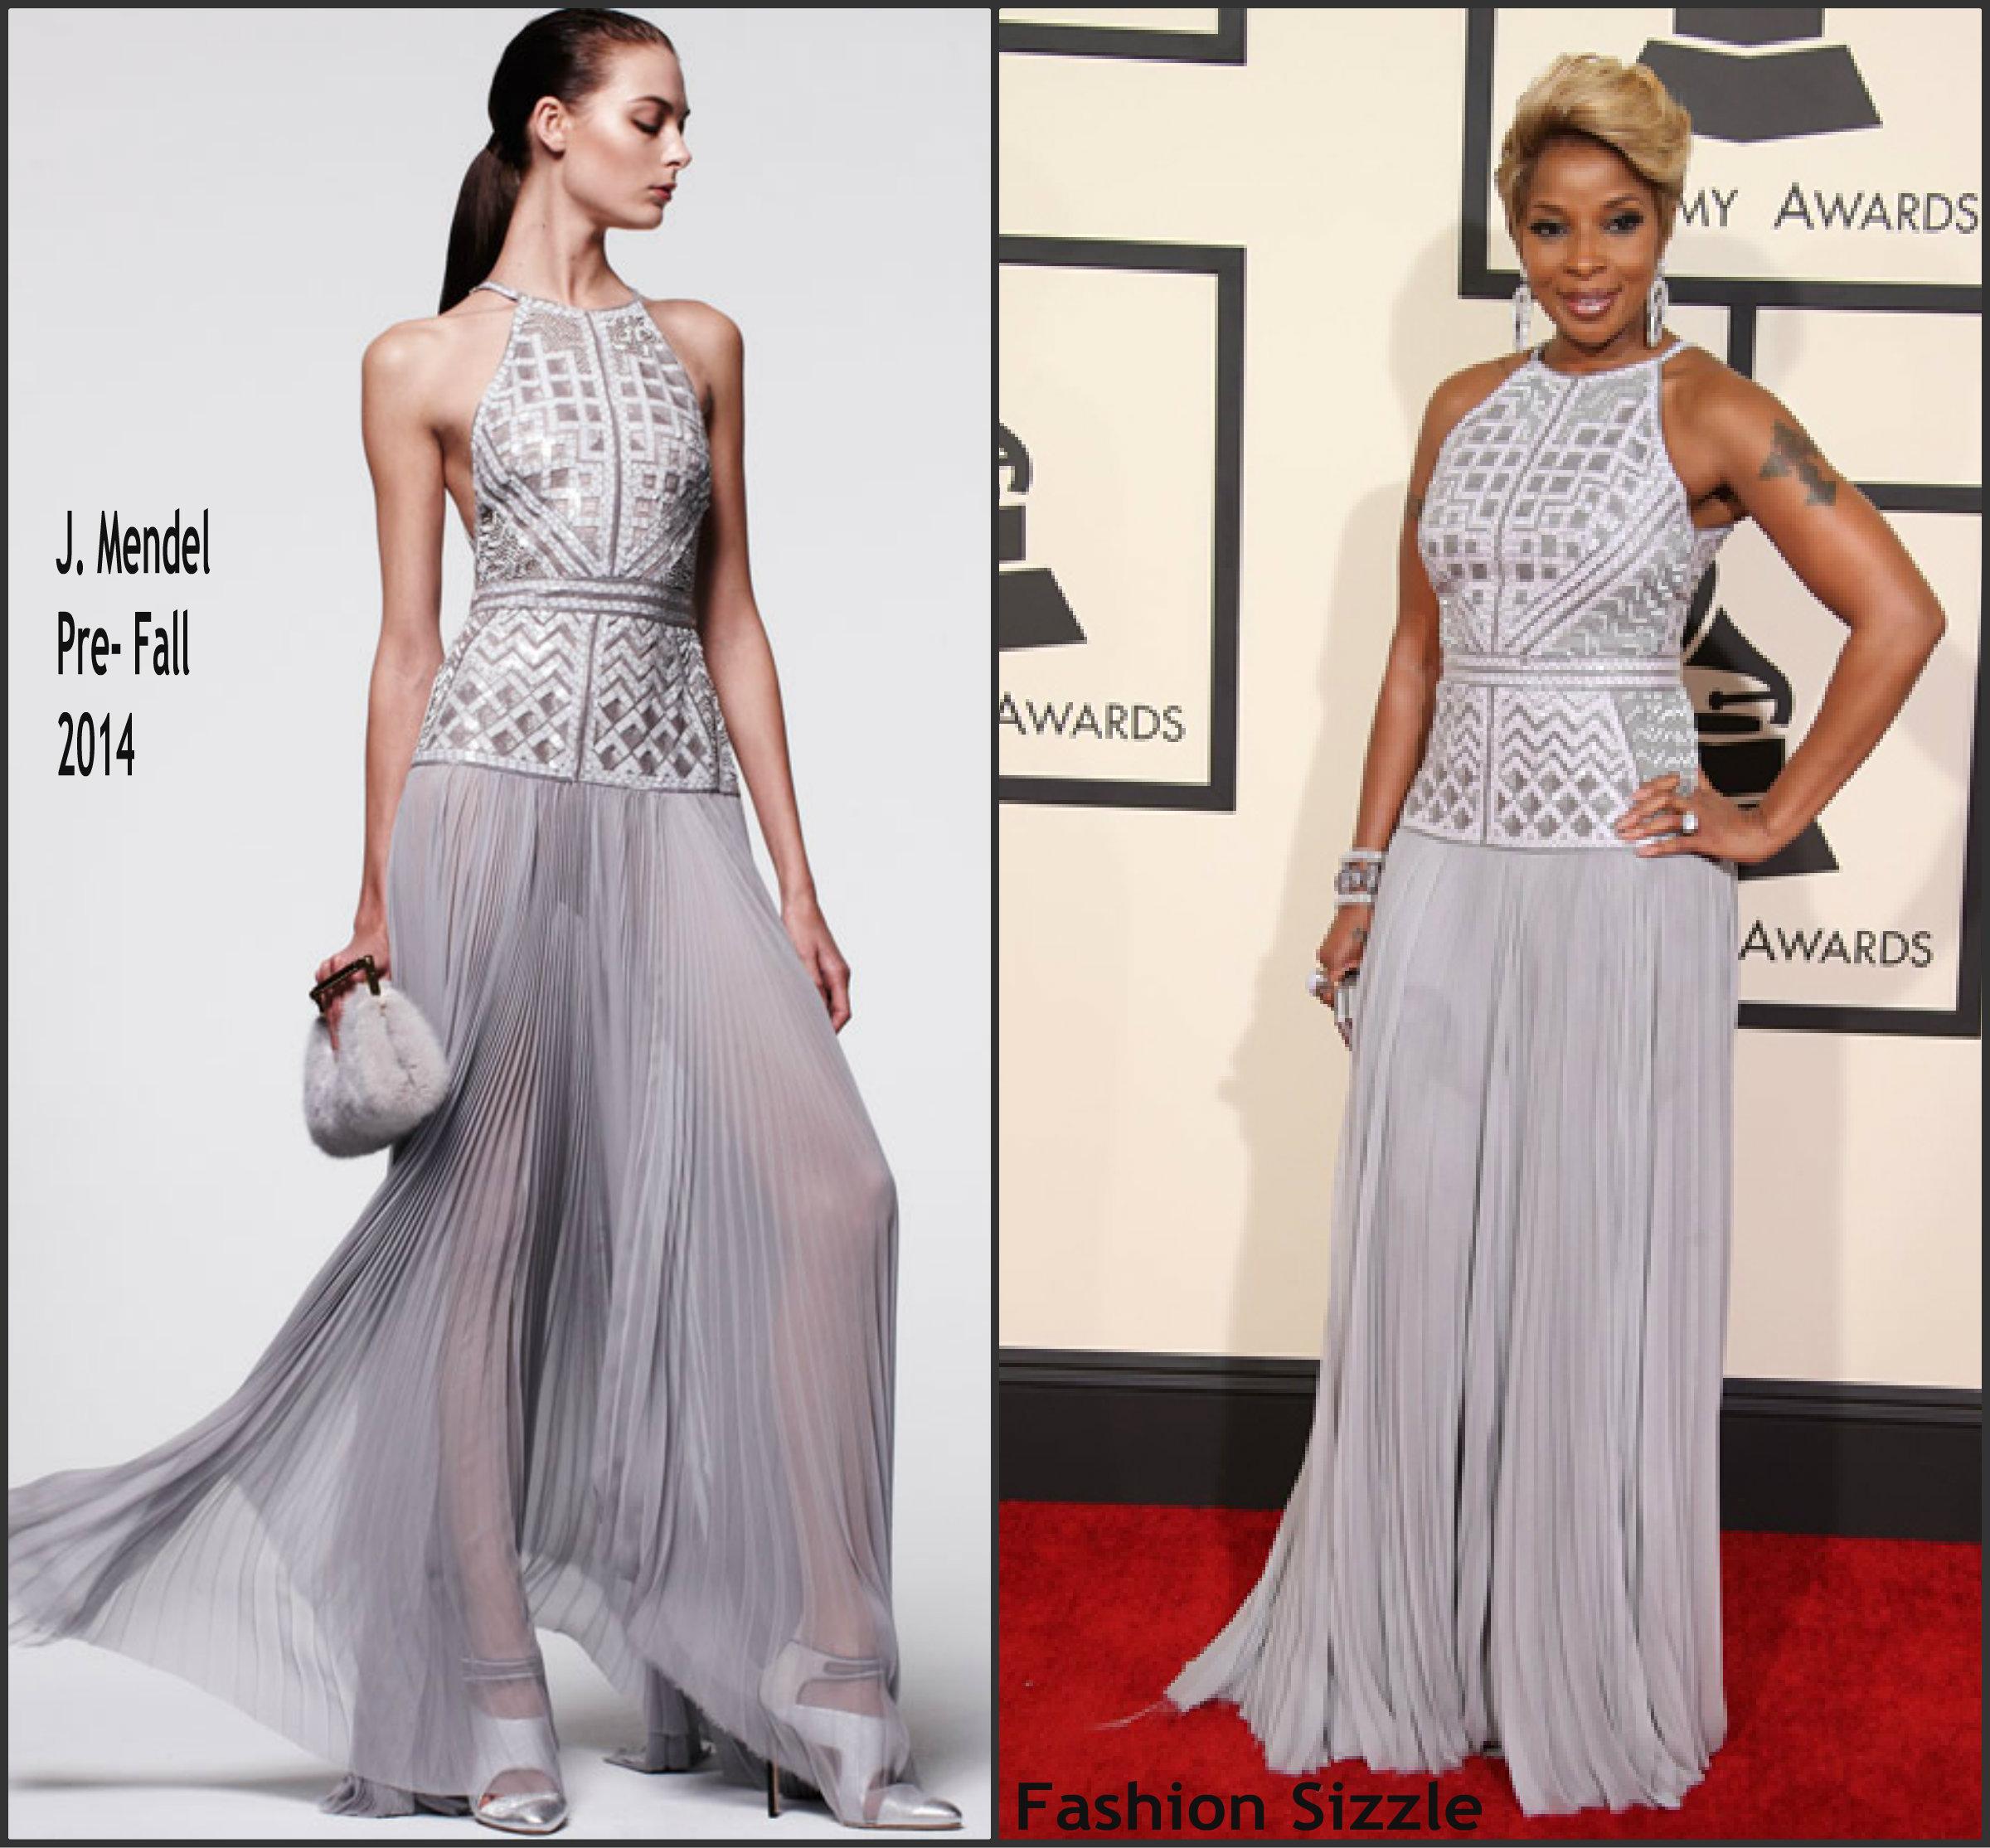 Mary-J-Blige-In-J-Mendel-at-the-2015 -Grammy-Awards